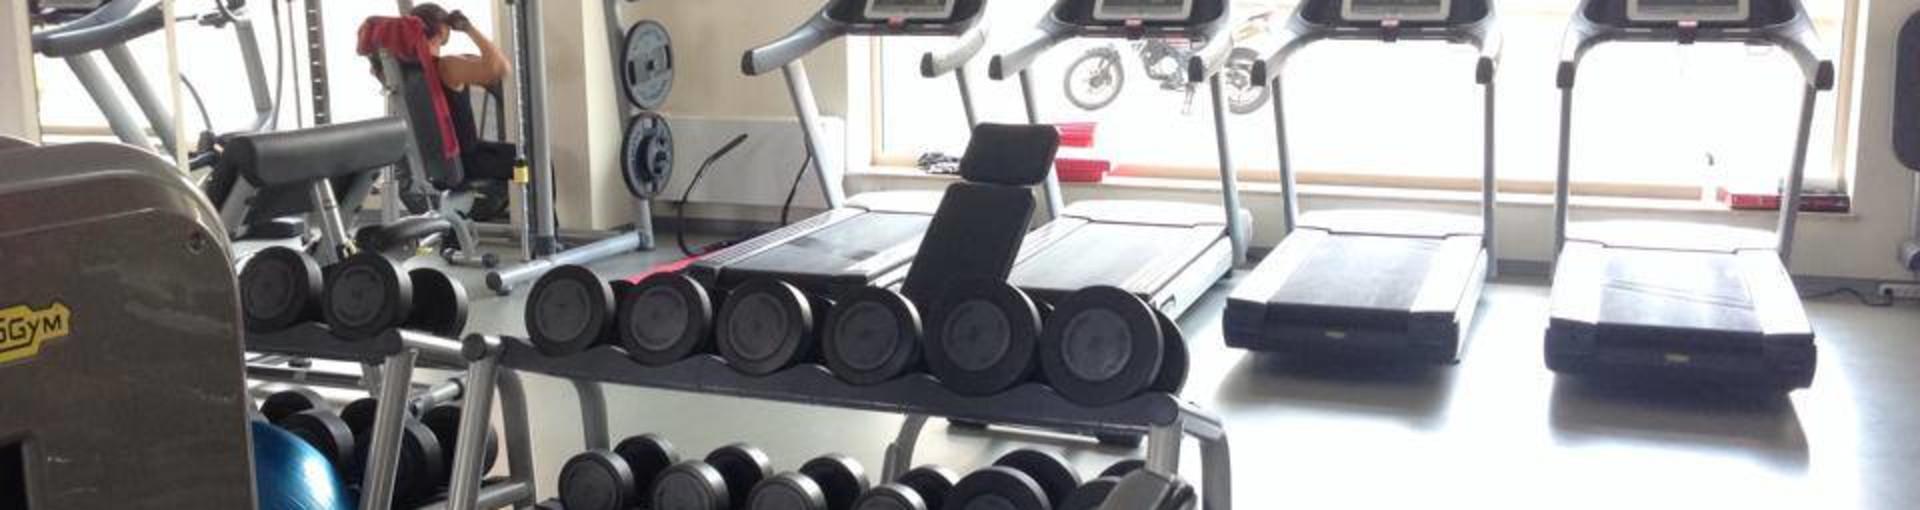 3.0 Fitness Club  - Ragusa